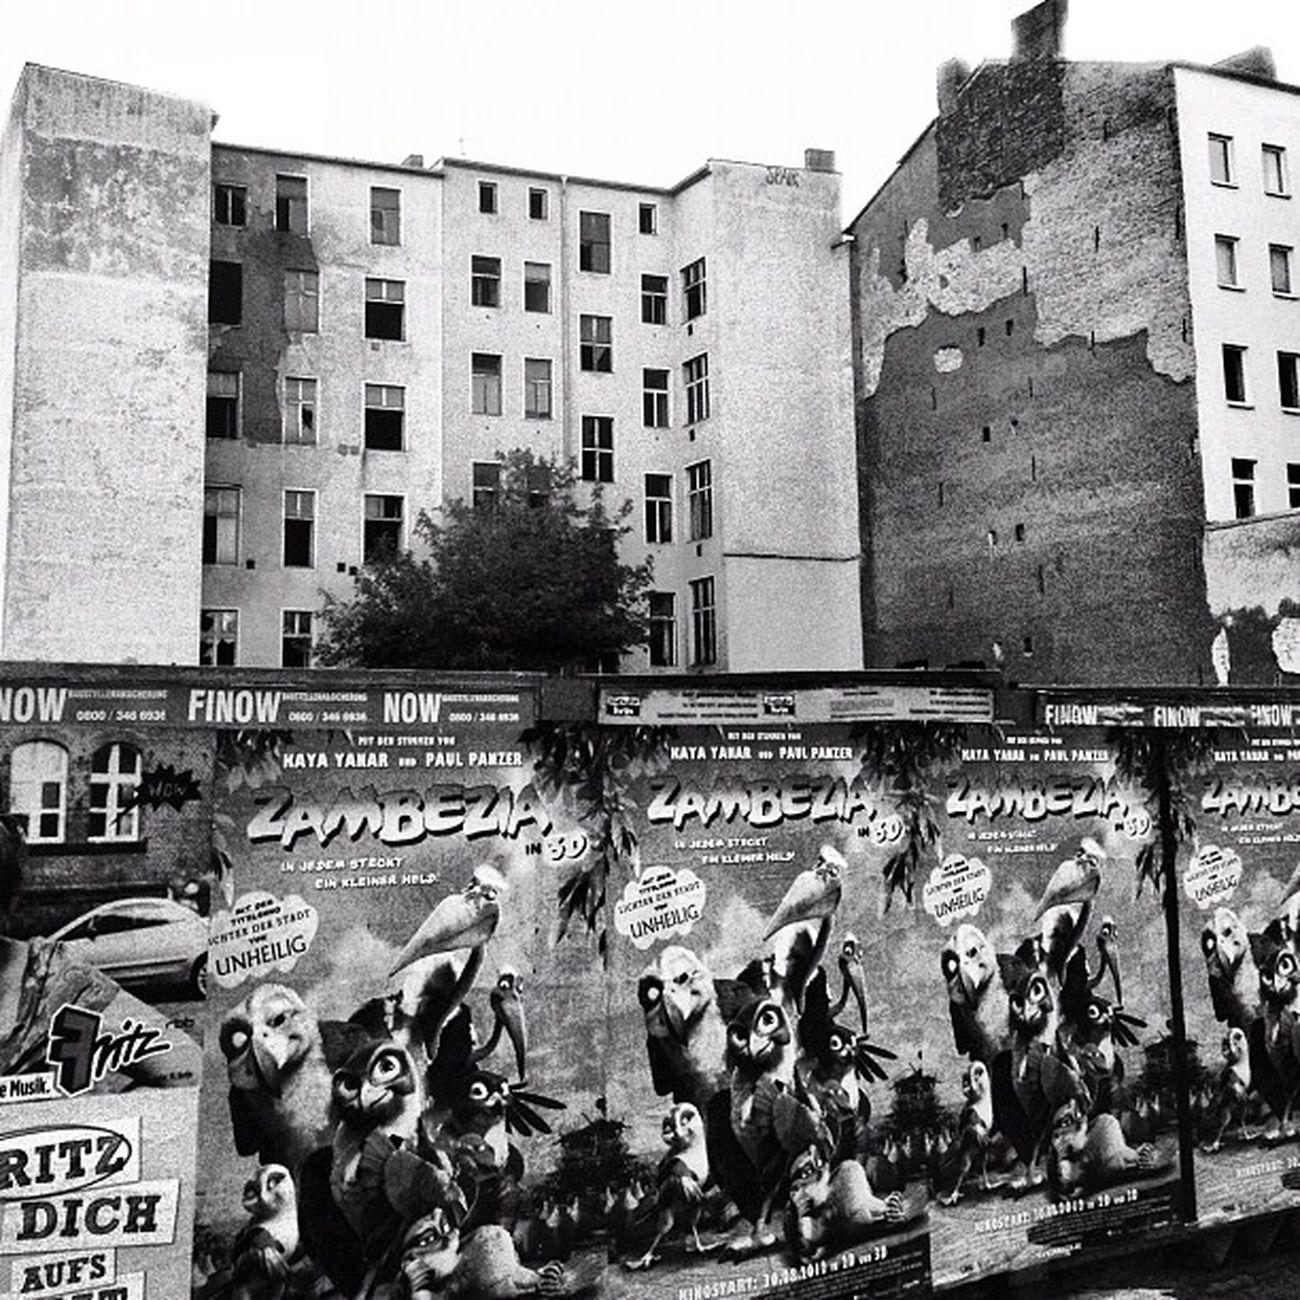 #architecture #Berlin #igersberlin #instagood #tweegram #photooftheday #follow #instamod #igers #picoftheday #instragamhub #instadaily #insta_germany #bestoftheday #igdaily #webstagram #instragramers #ig_special #bw #blackamdwhite #berlinmitte IGDaily Tweegram Instagood Webstagram Instadaily Igersberlin Berlinmitte Insta_germany Architecture Instragramers Berlin Ig_special Bw Instragamhub Photooftheday Instamod Picoftheday Blackamdwhite Follow Bestoftheday Igers